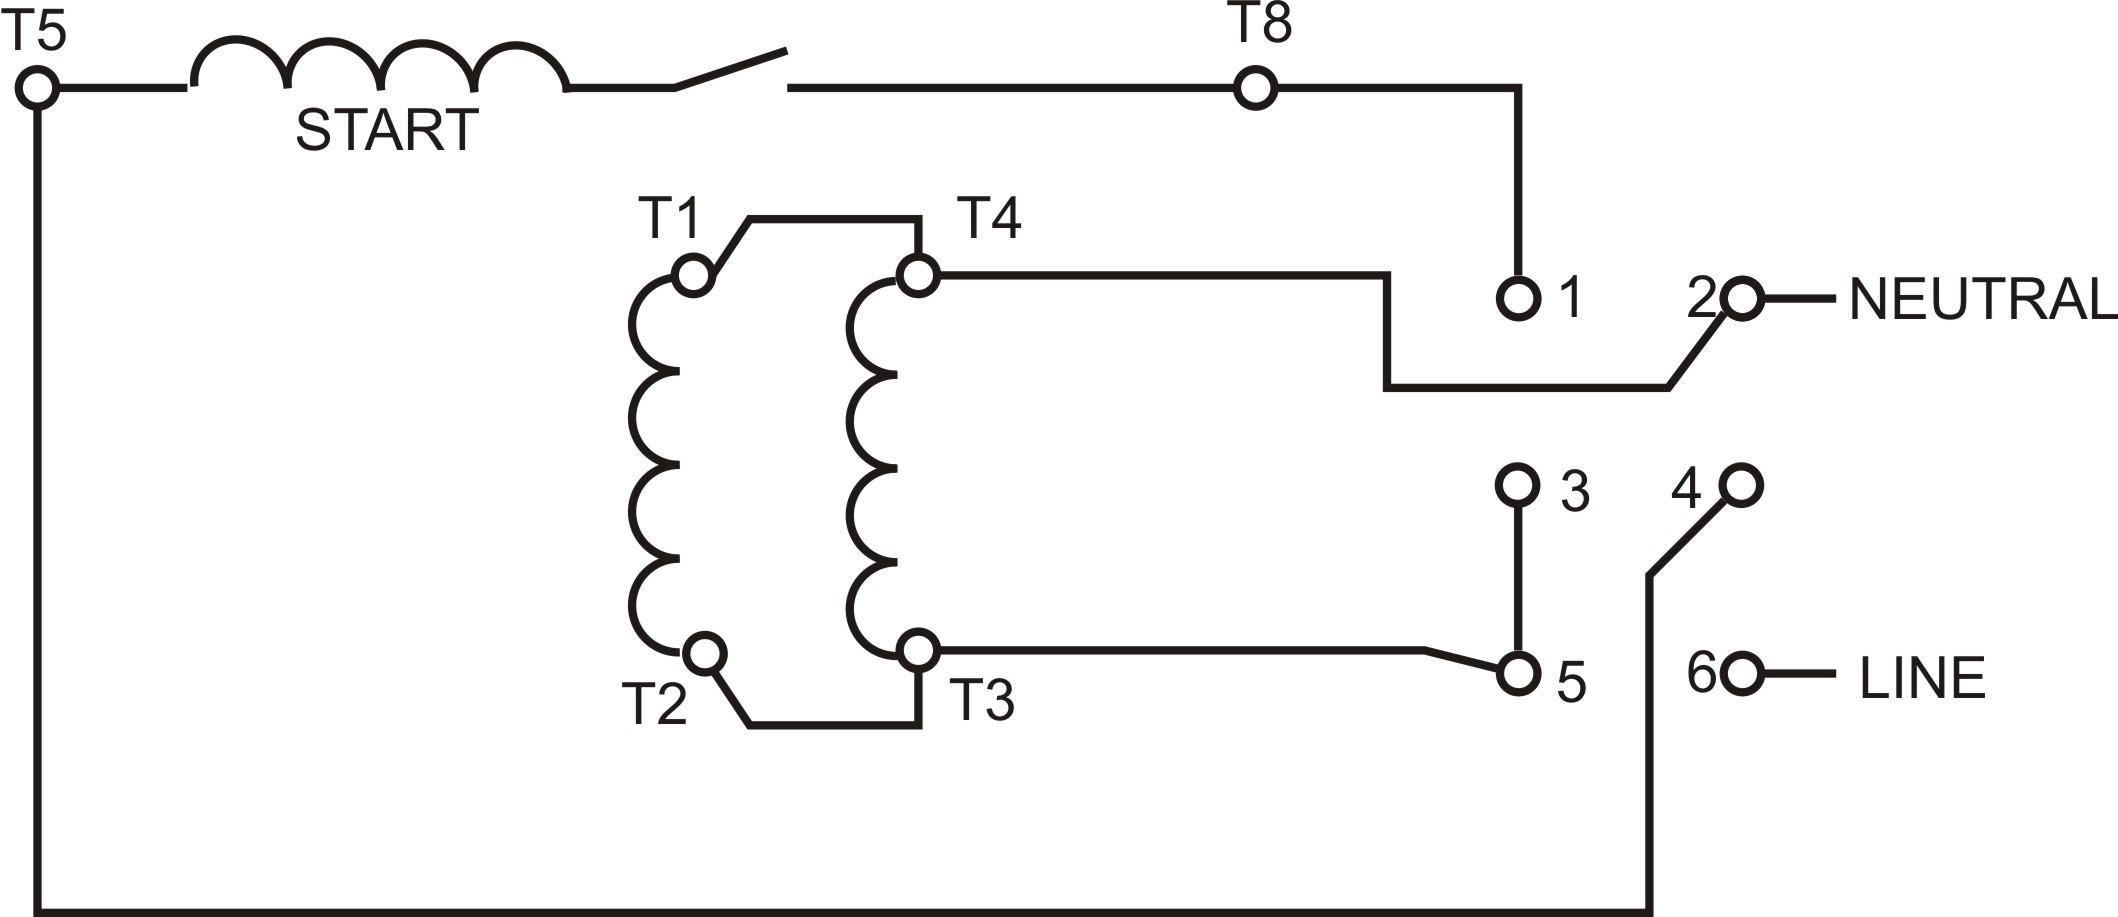 110v 220v Motor Wiring Diagram